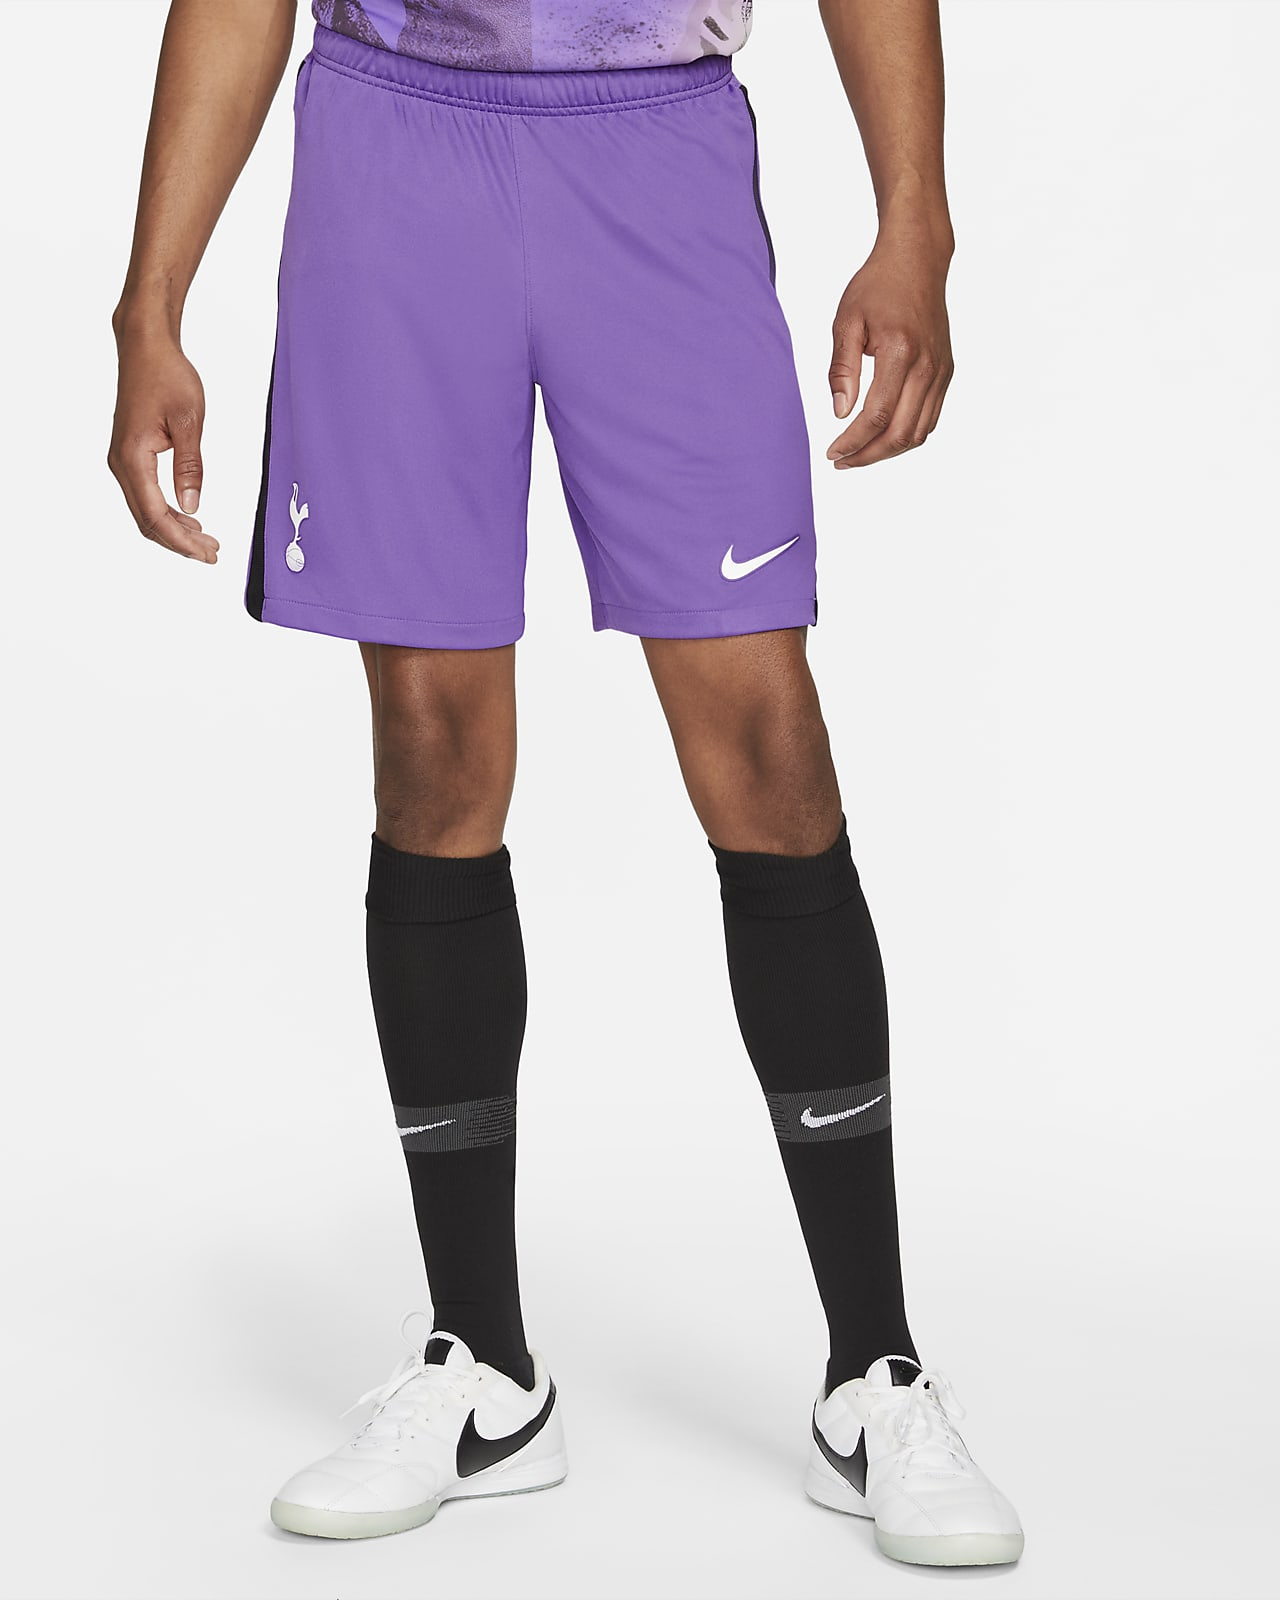 Short de football Nike Dri-FIT Tottenham Hotspur 2021/22 Stadium Third pour Homme